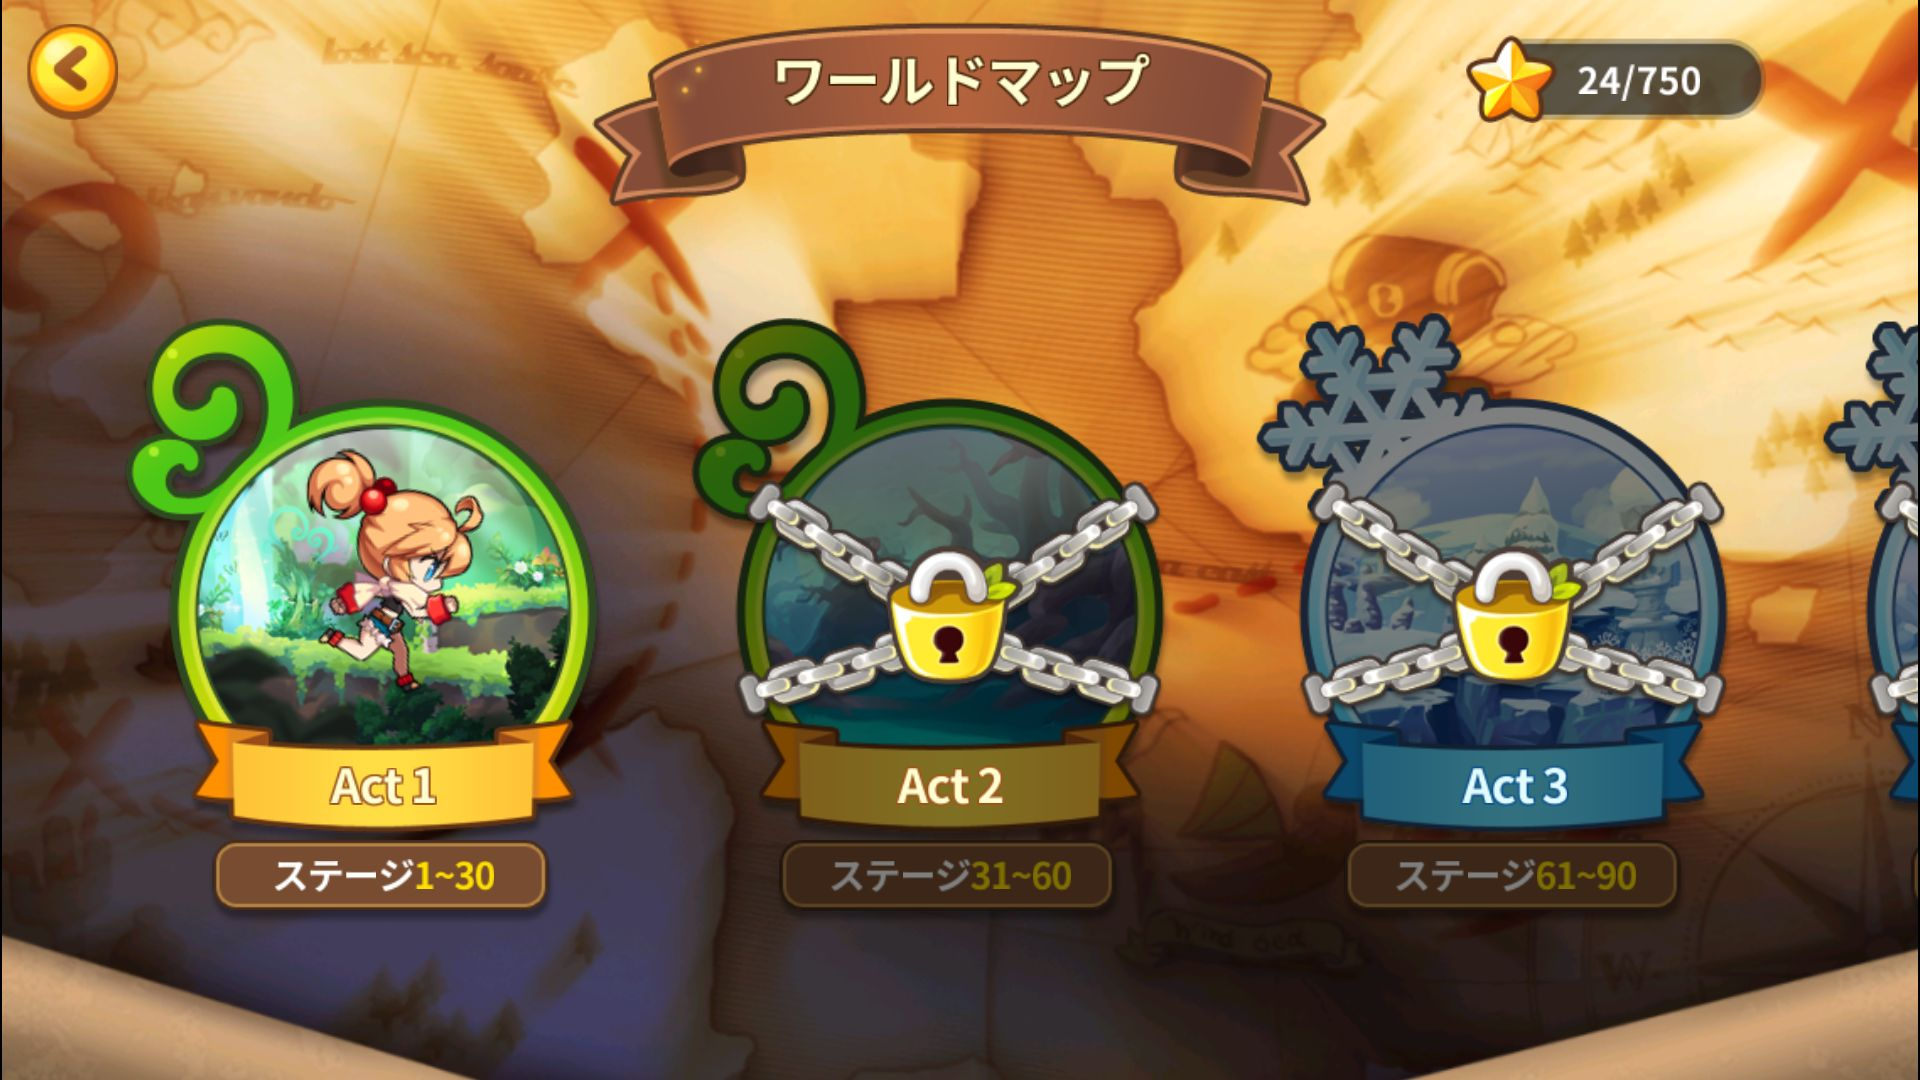 androidアプリ ウィンドランナーアドベンチャー(WIND runner adventure)攻略スクリーンショット5